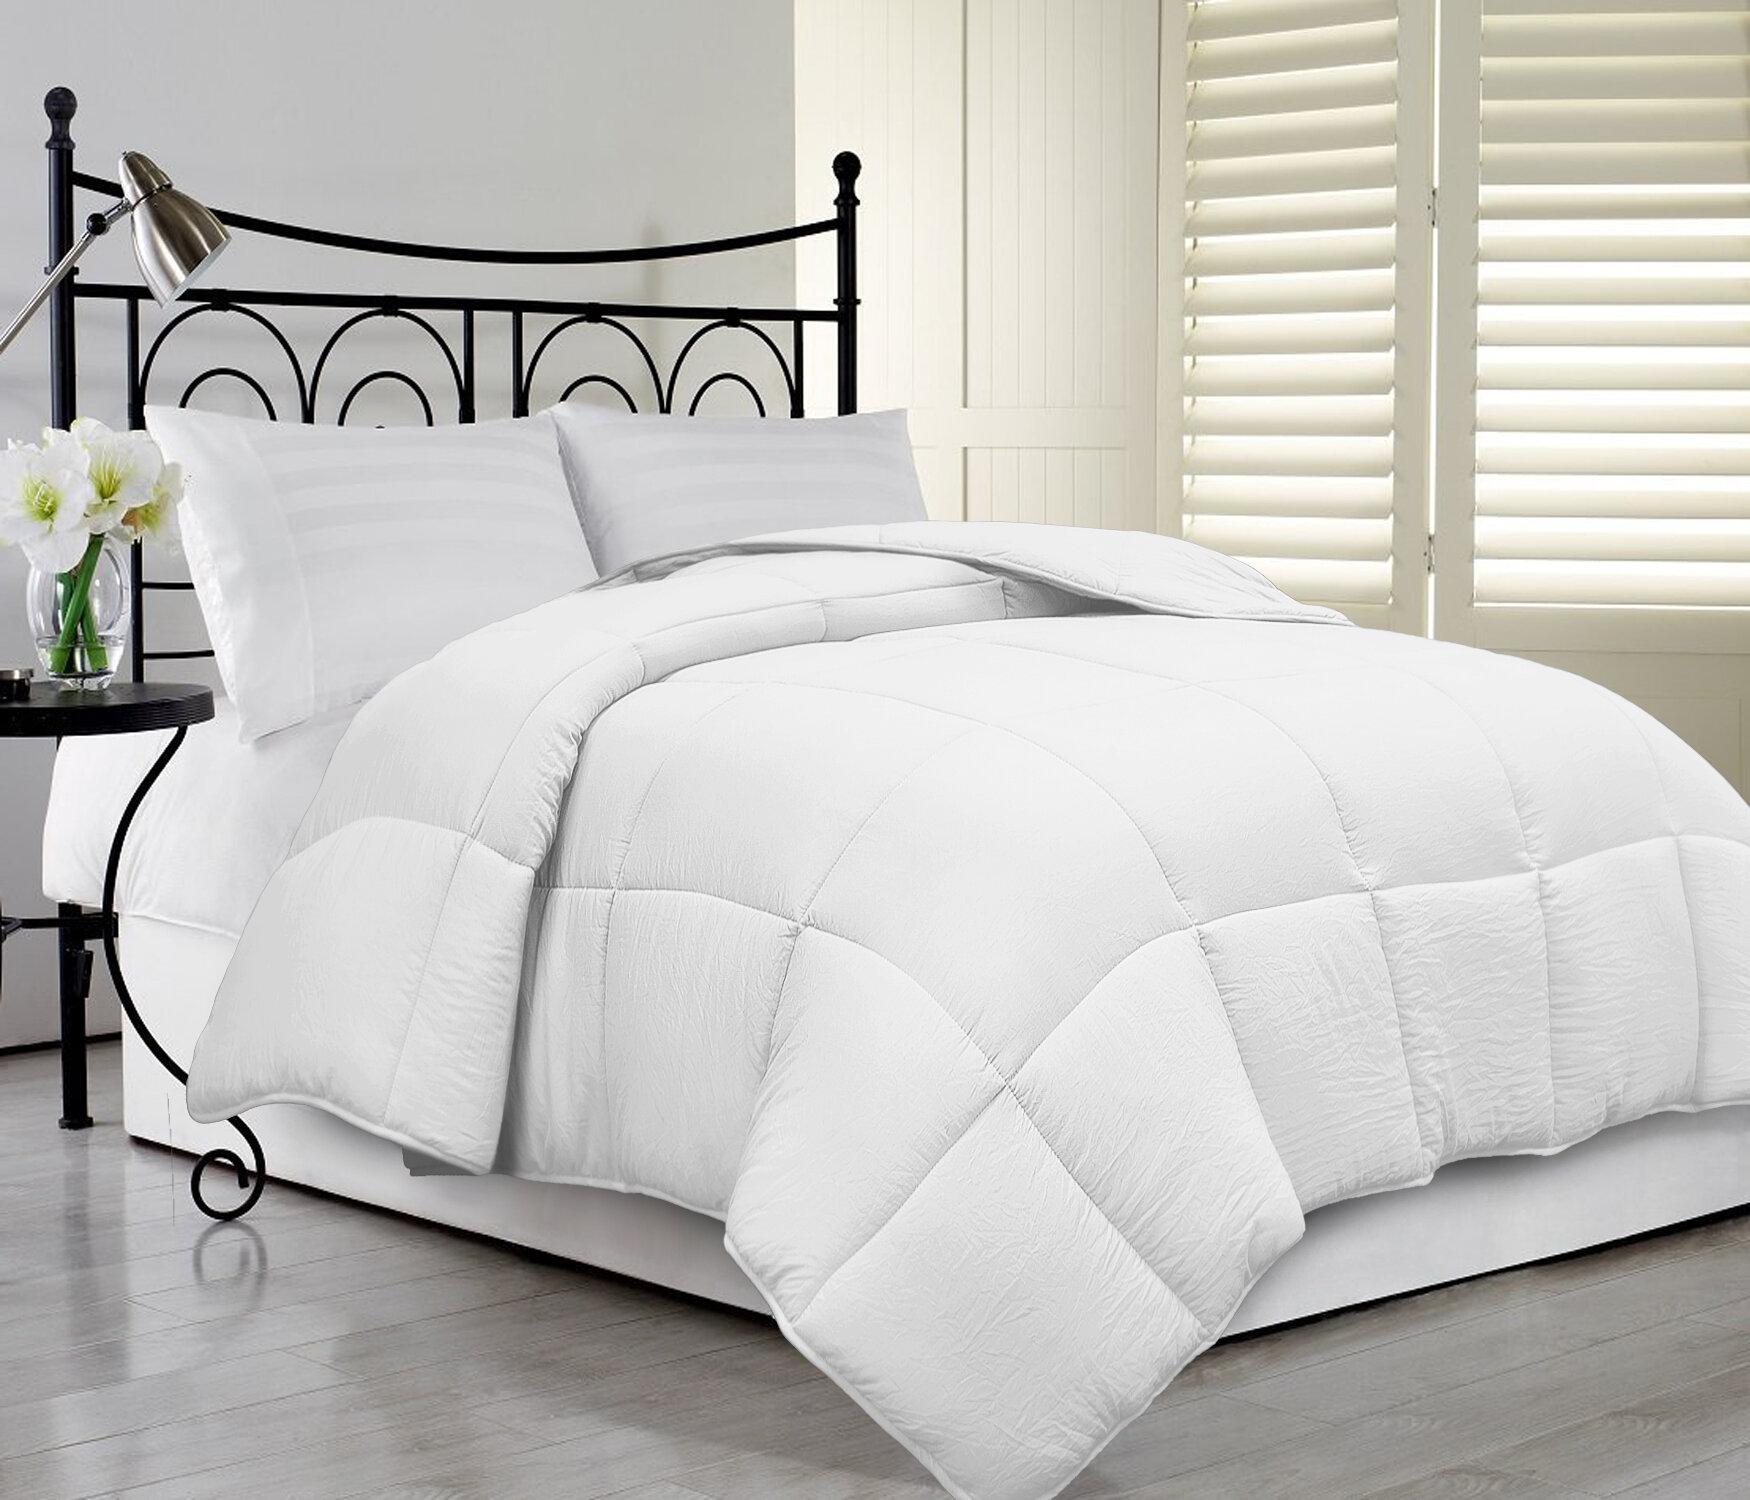 White Noise Ultra Soft Supper Fluffy All Season Down Alternative Comforter Reviews Wayfair